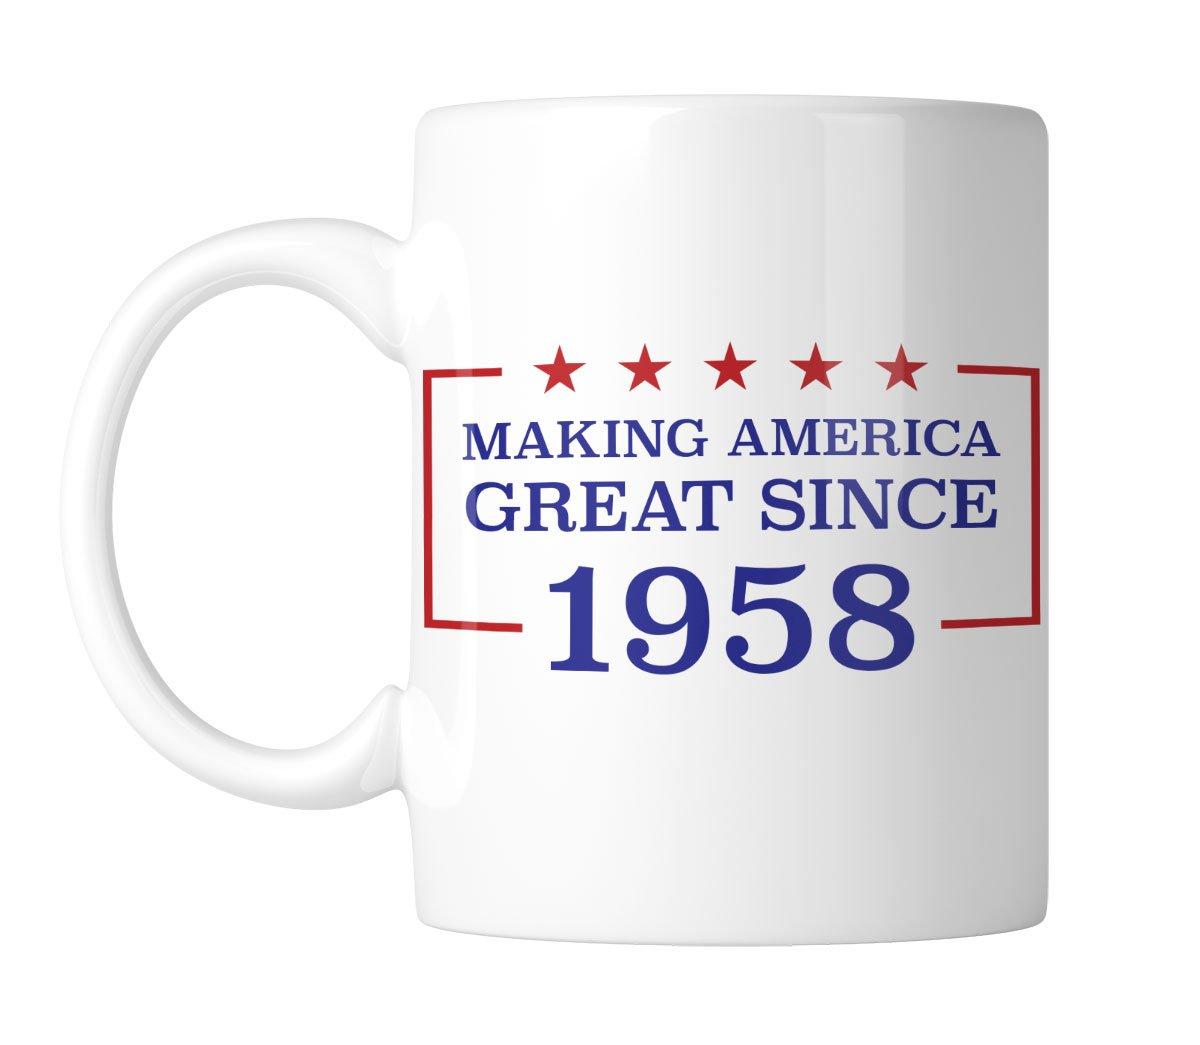 Making America Great Since 1958-60th Birthday 11 oz. Mug (1 Mug) by Inkeezy (Image #1)